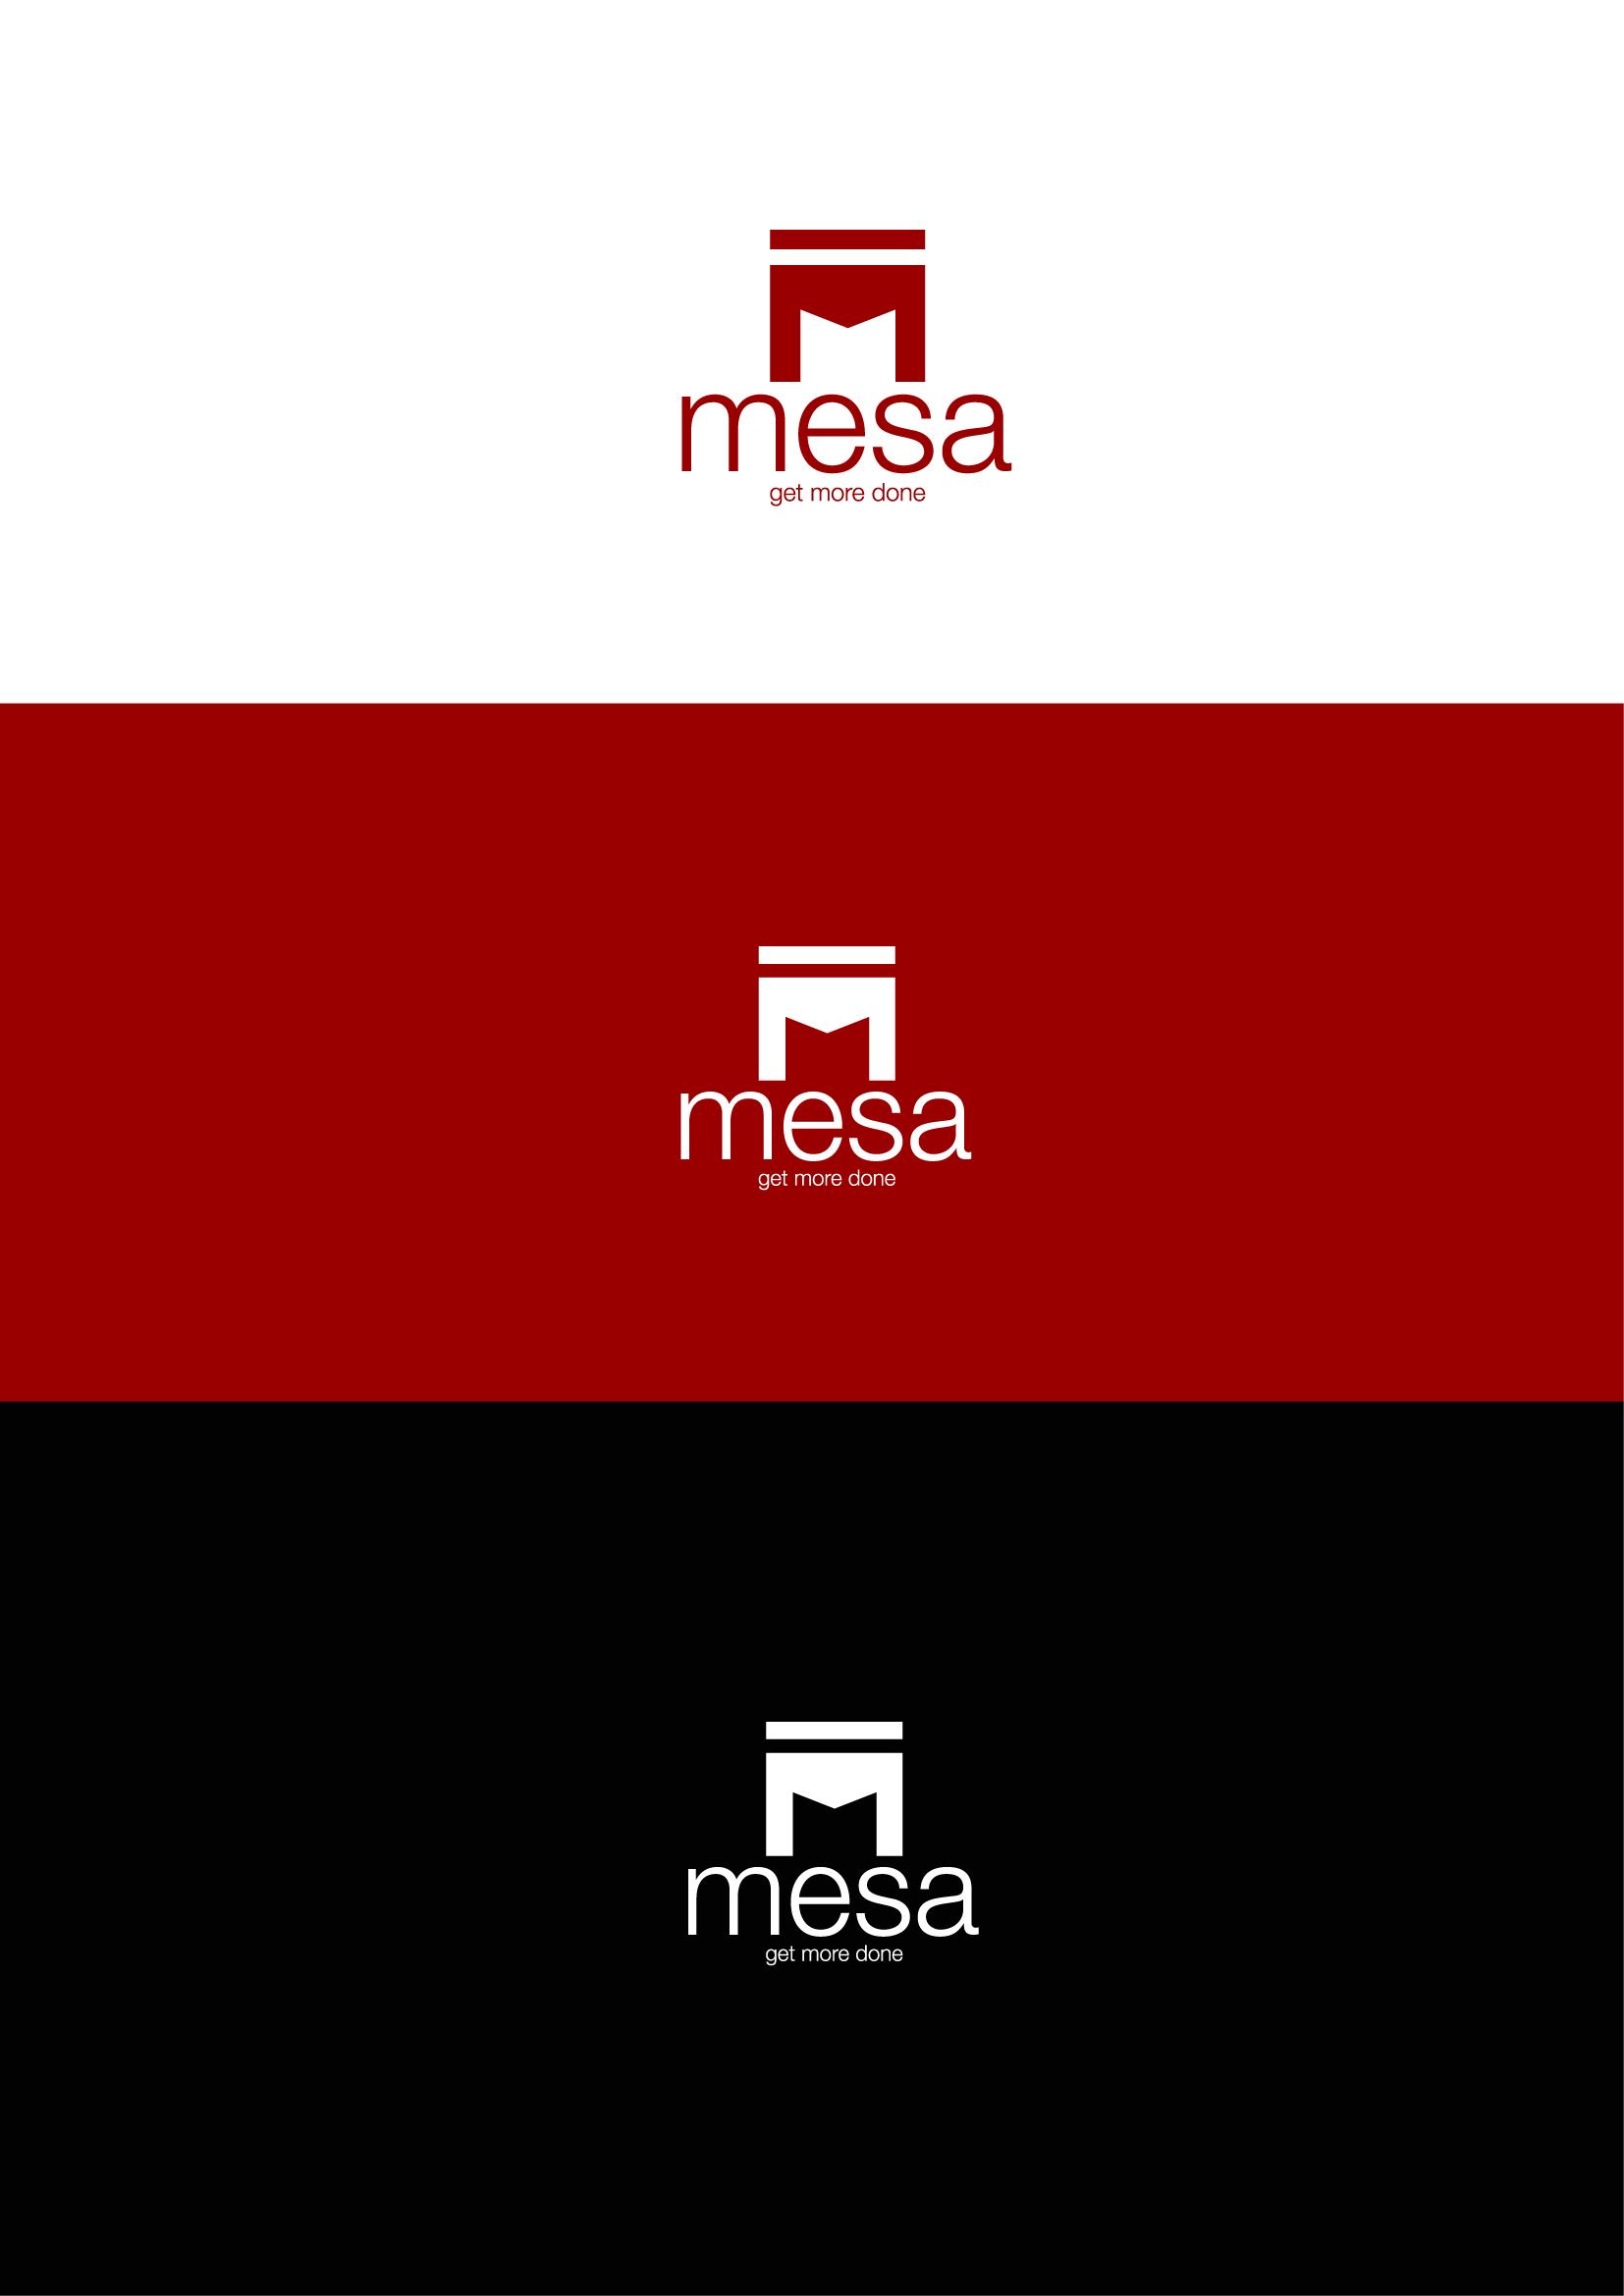 Logo Design by Osi Indra - Entry No. 104 in the Logo Design Contest Logo Design for Mesa.